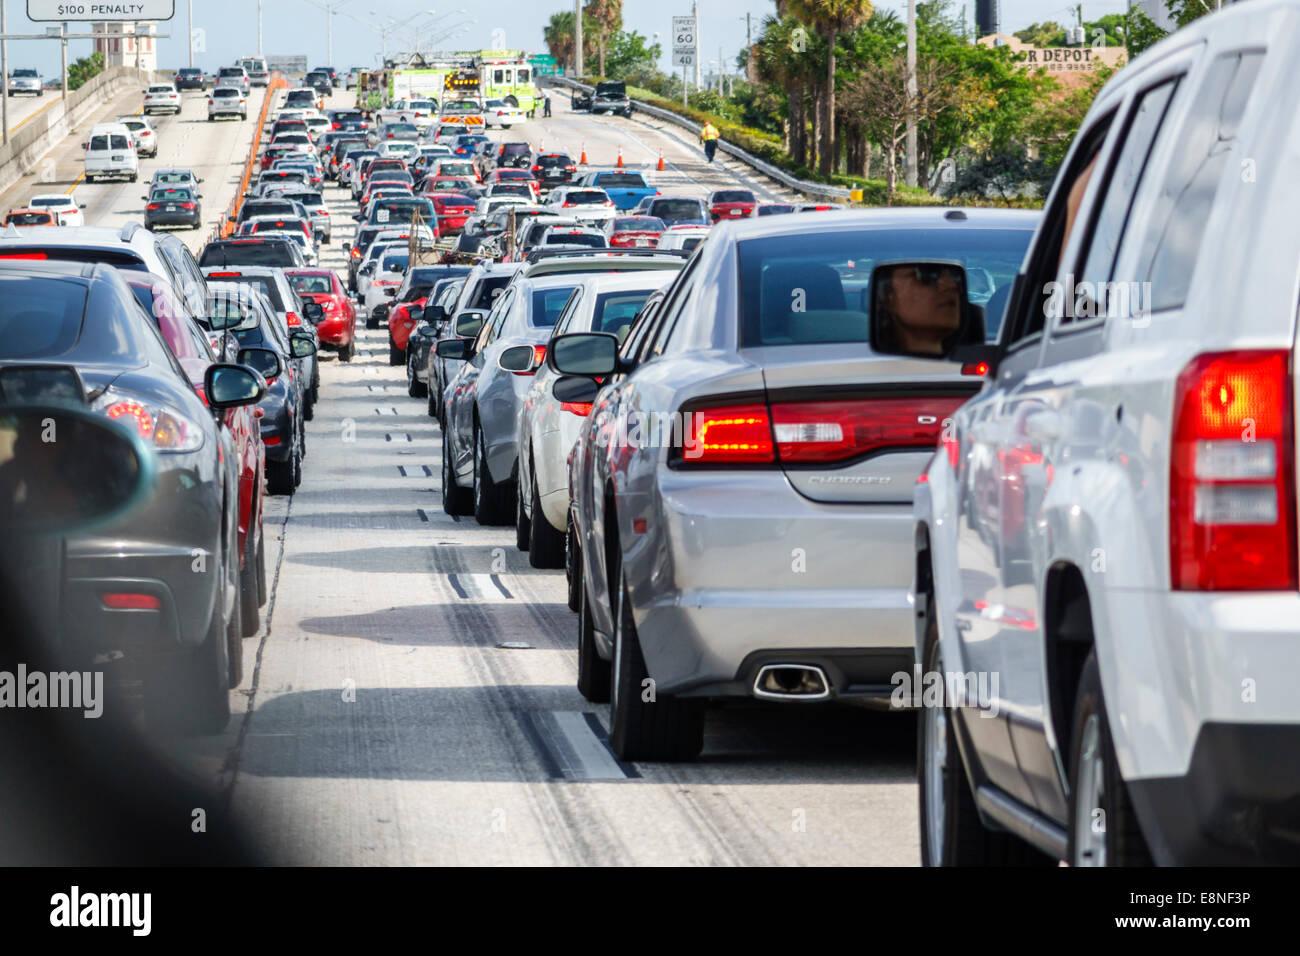 Miami Florida Interstate I-95 highway traffic stopped slowed jam